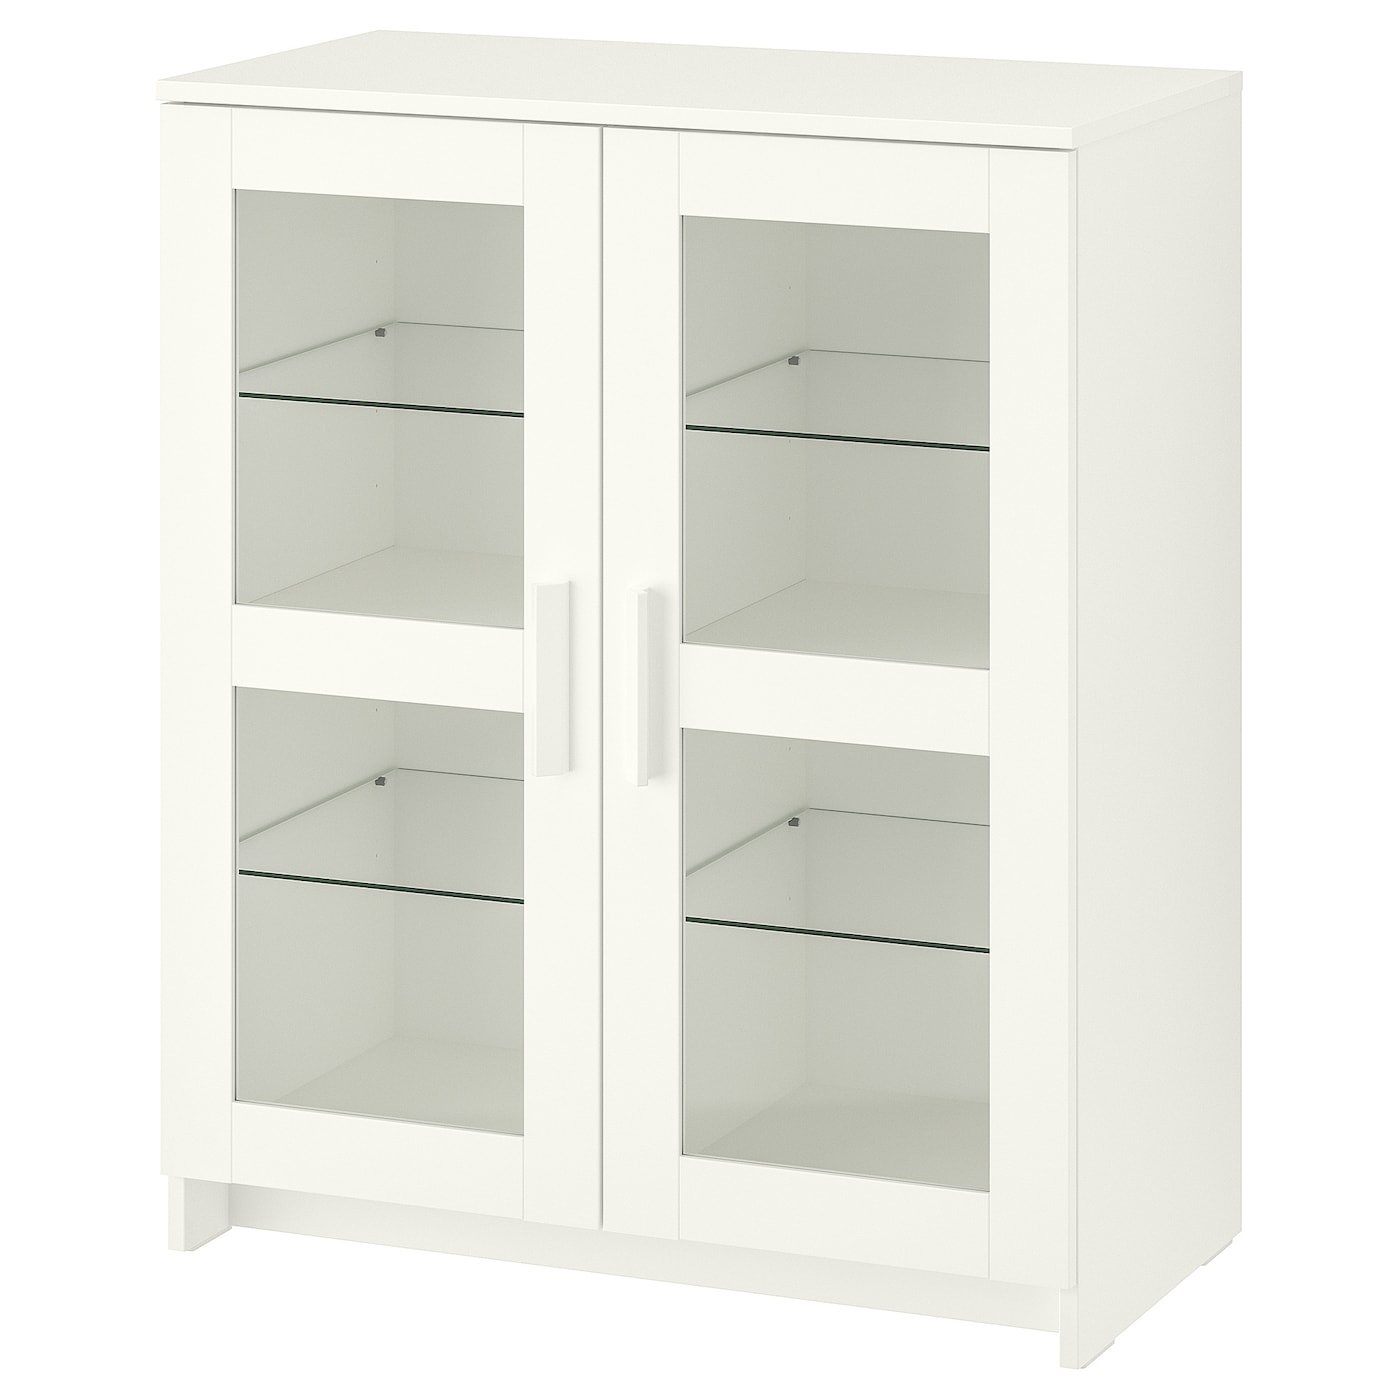 Brimnes Cabinet With Doors Glasswhite 78 X 95 Cm Ikea